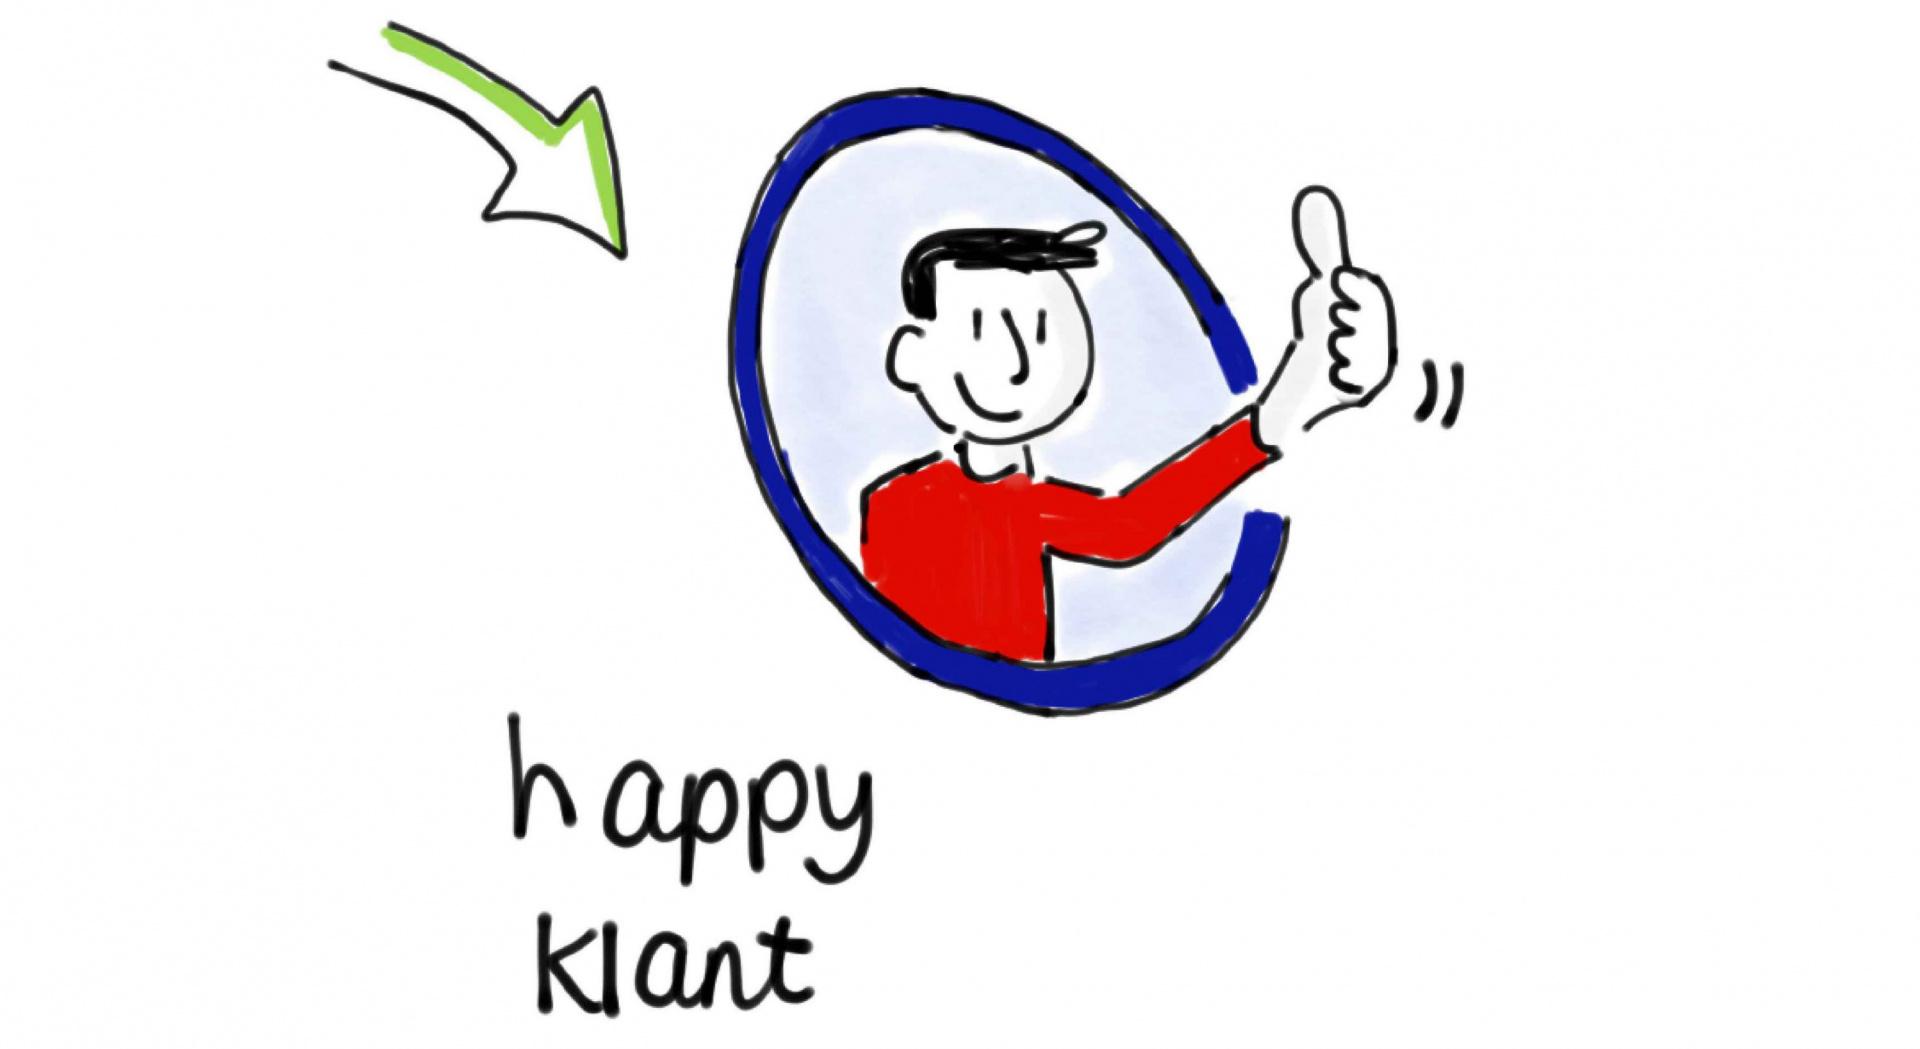 klantreis-happyklant_witruimte.jpg